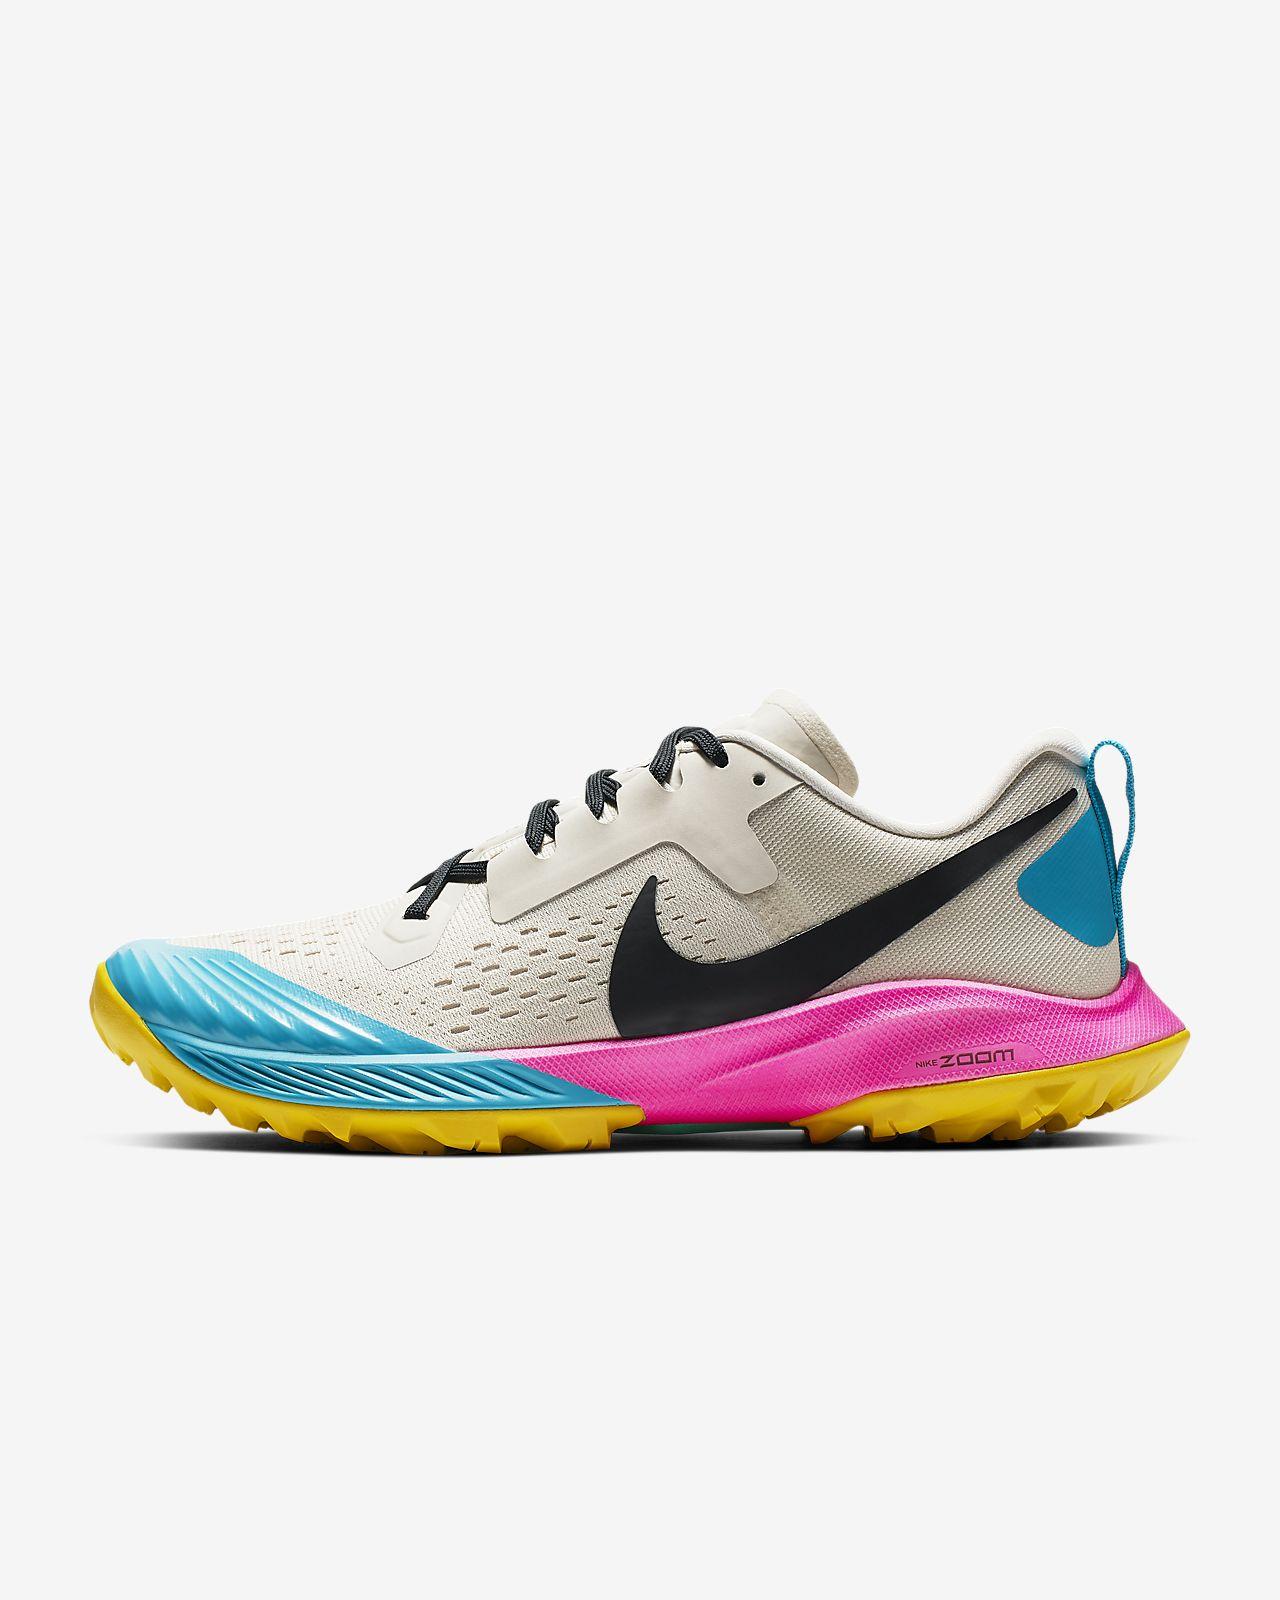 4ddbc169b70e8 Nike Air Zoom Terra Kiger 5 Women s Running Shoe. Nike.com DK